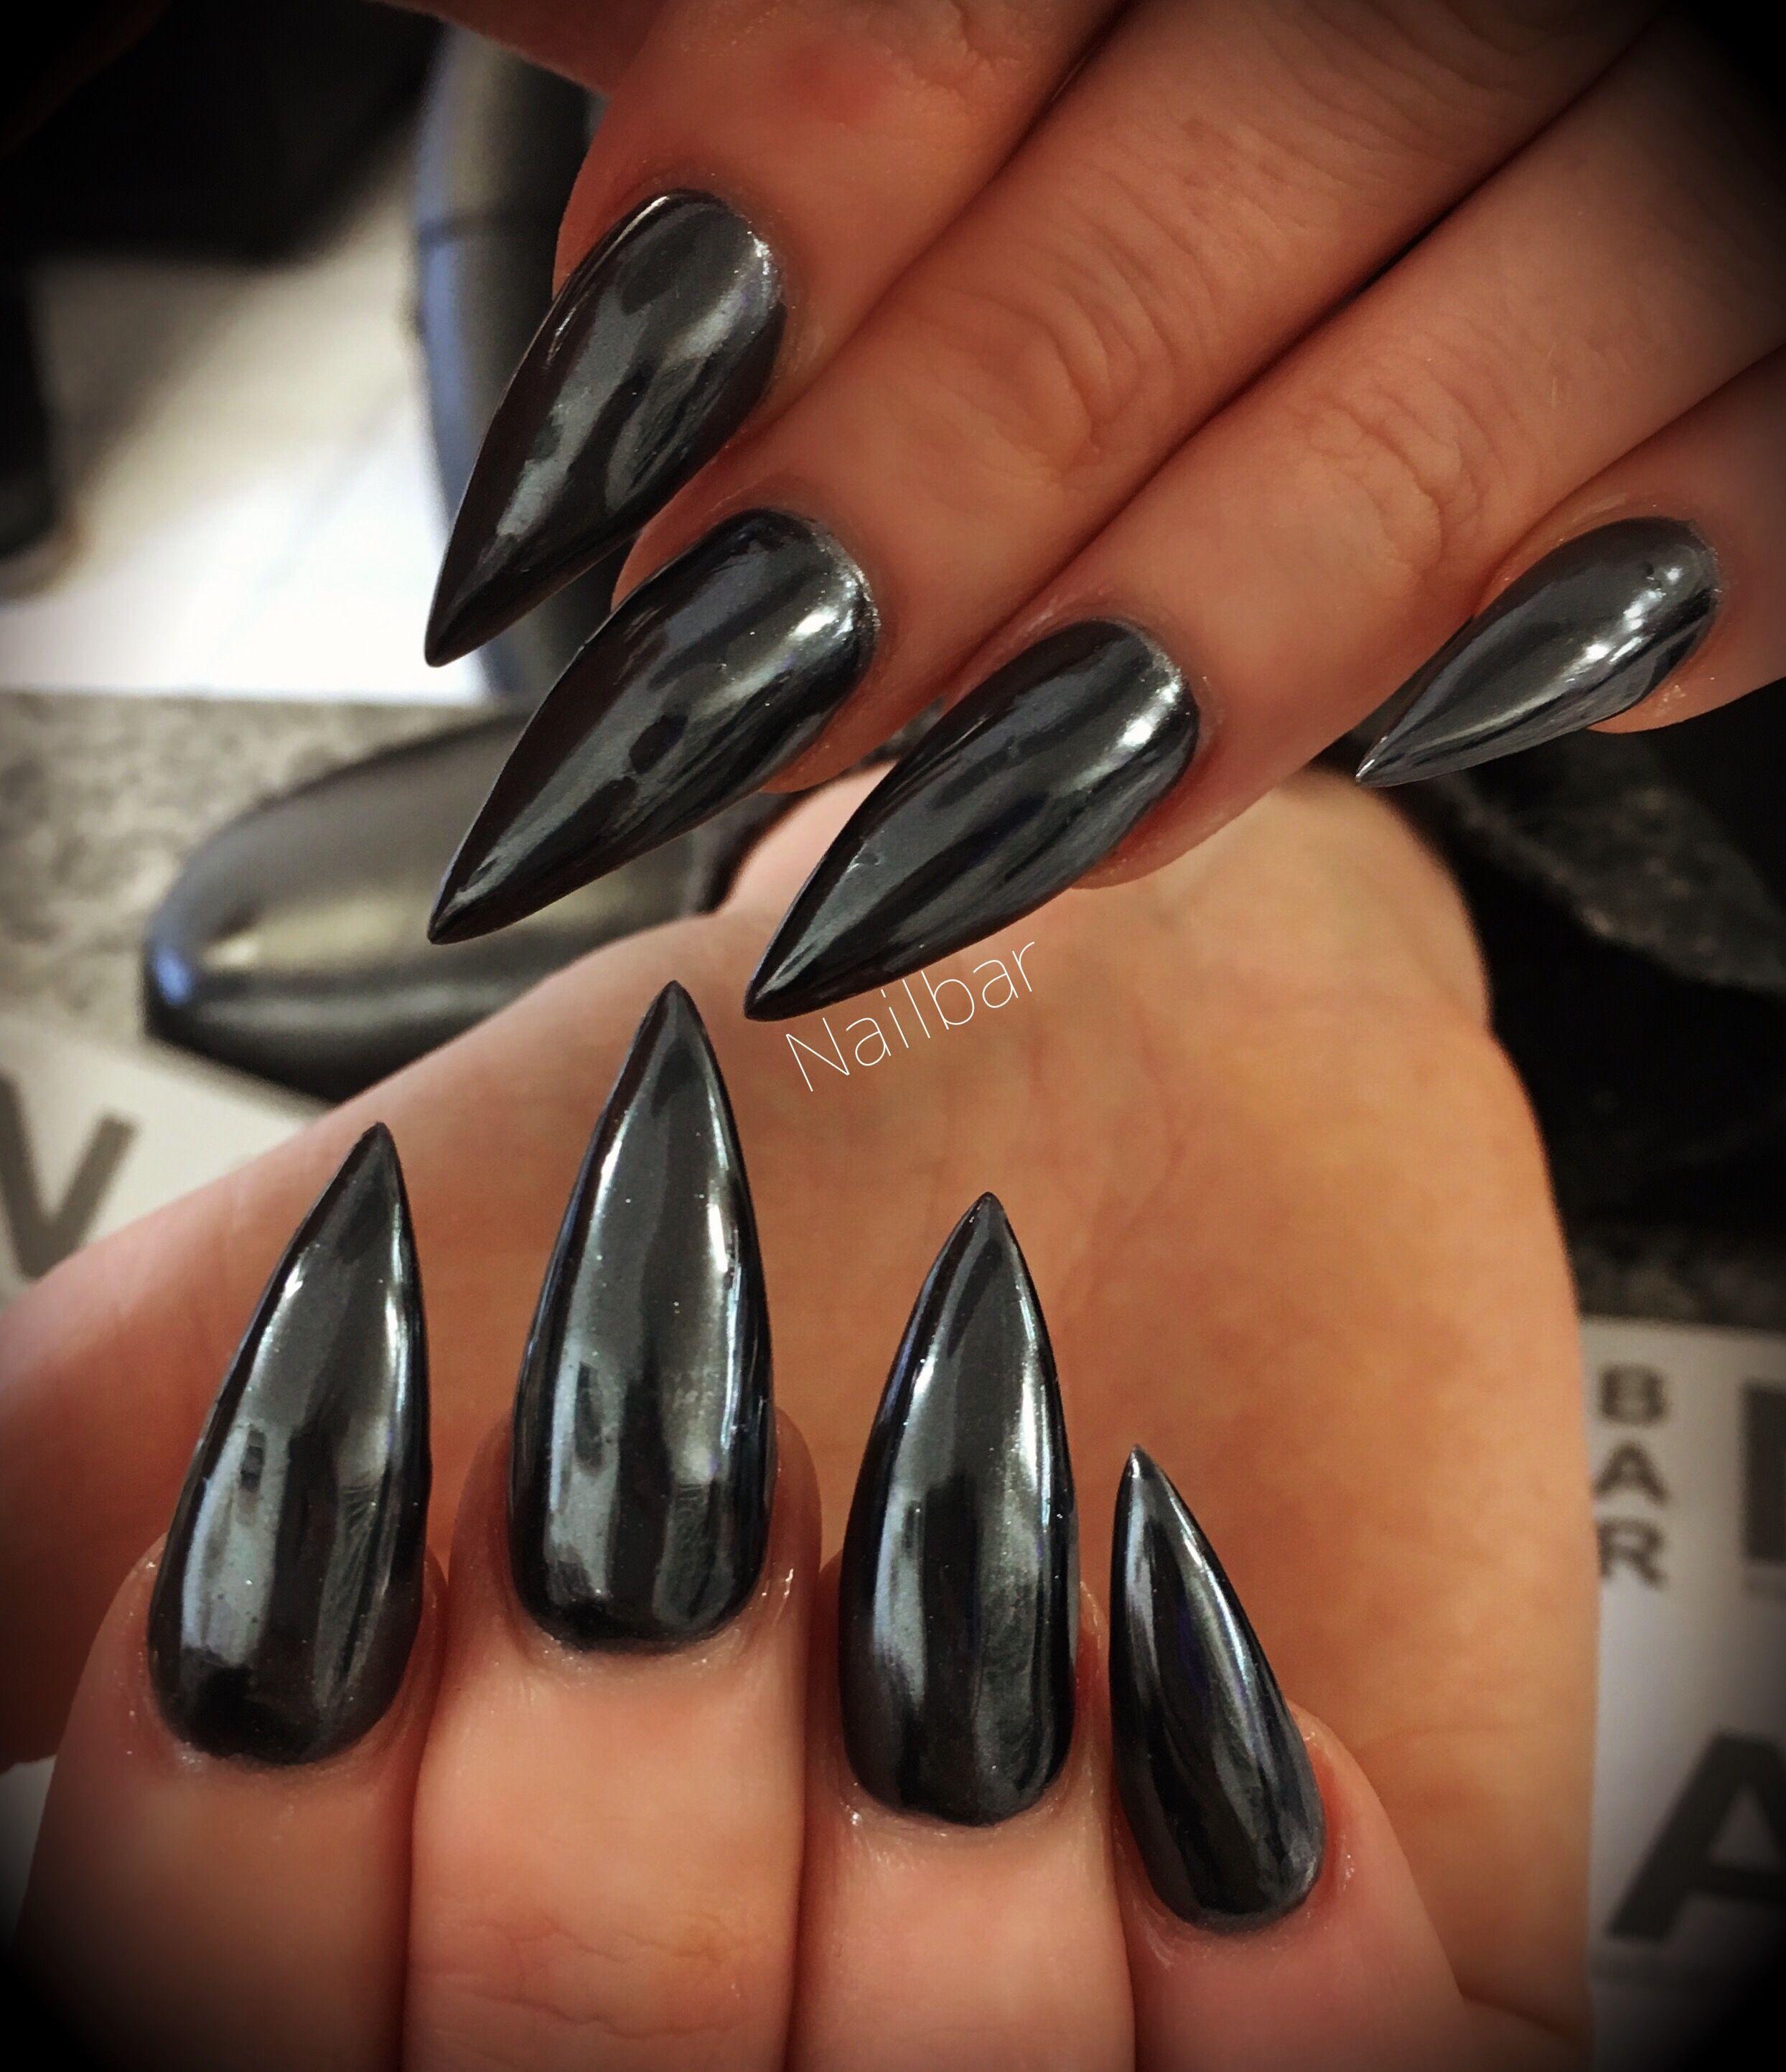 Black Chrome Black Chrome Nails Chrome Nails Black Crome Nails